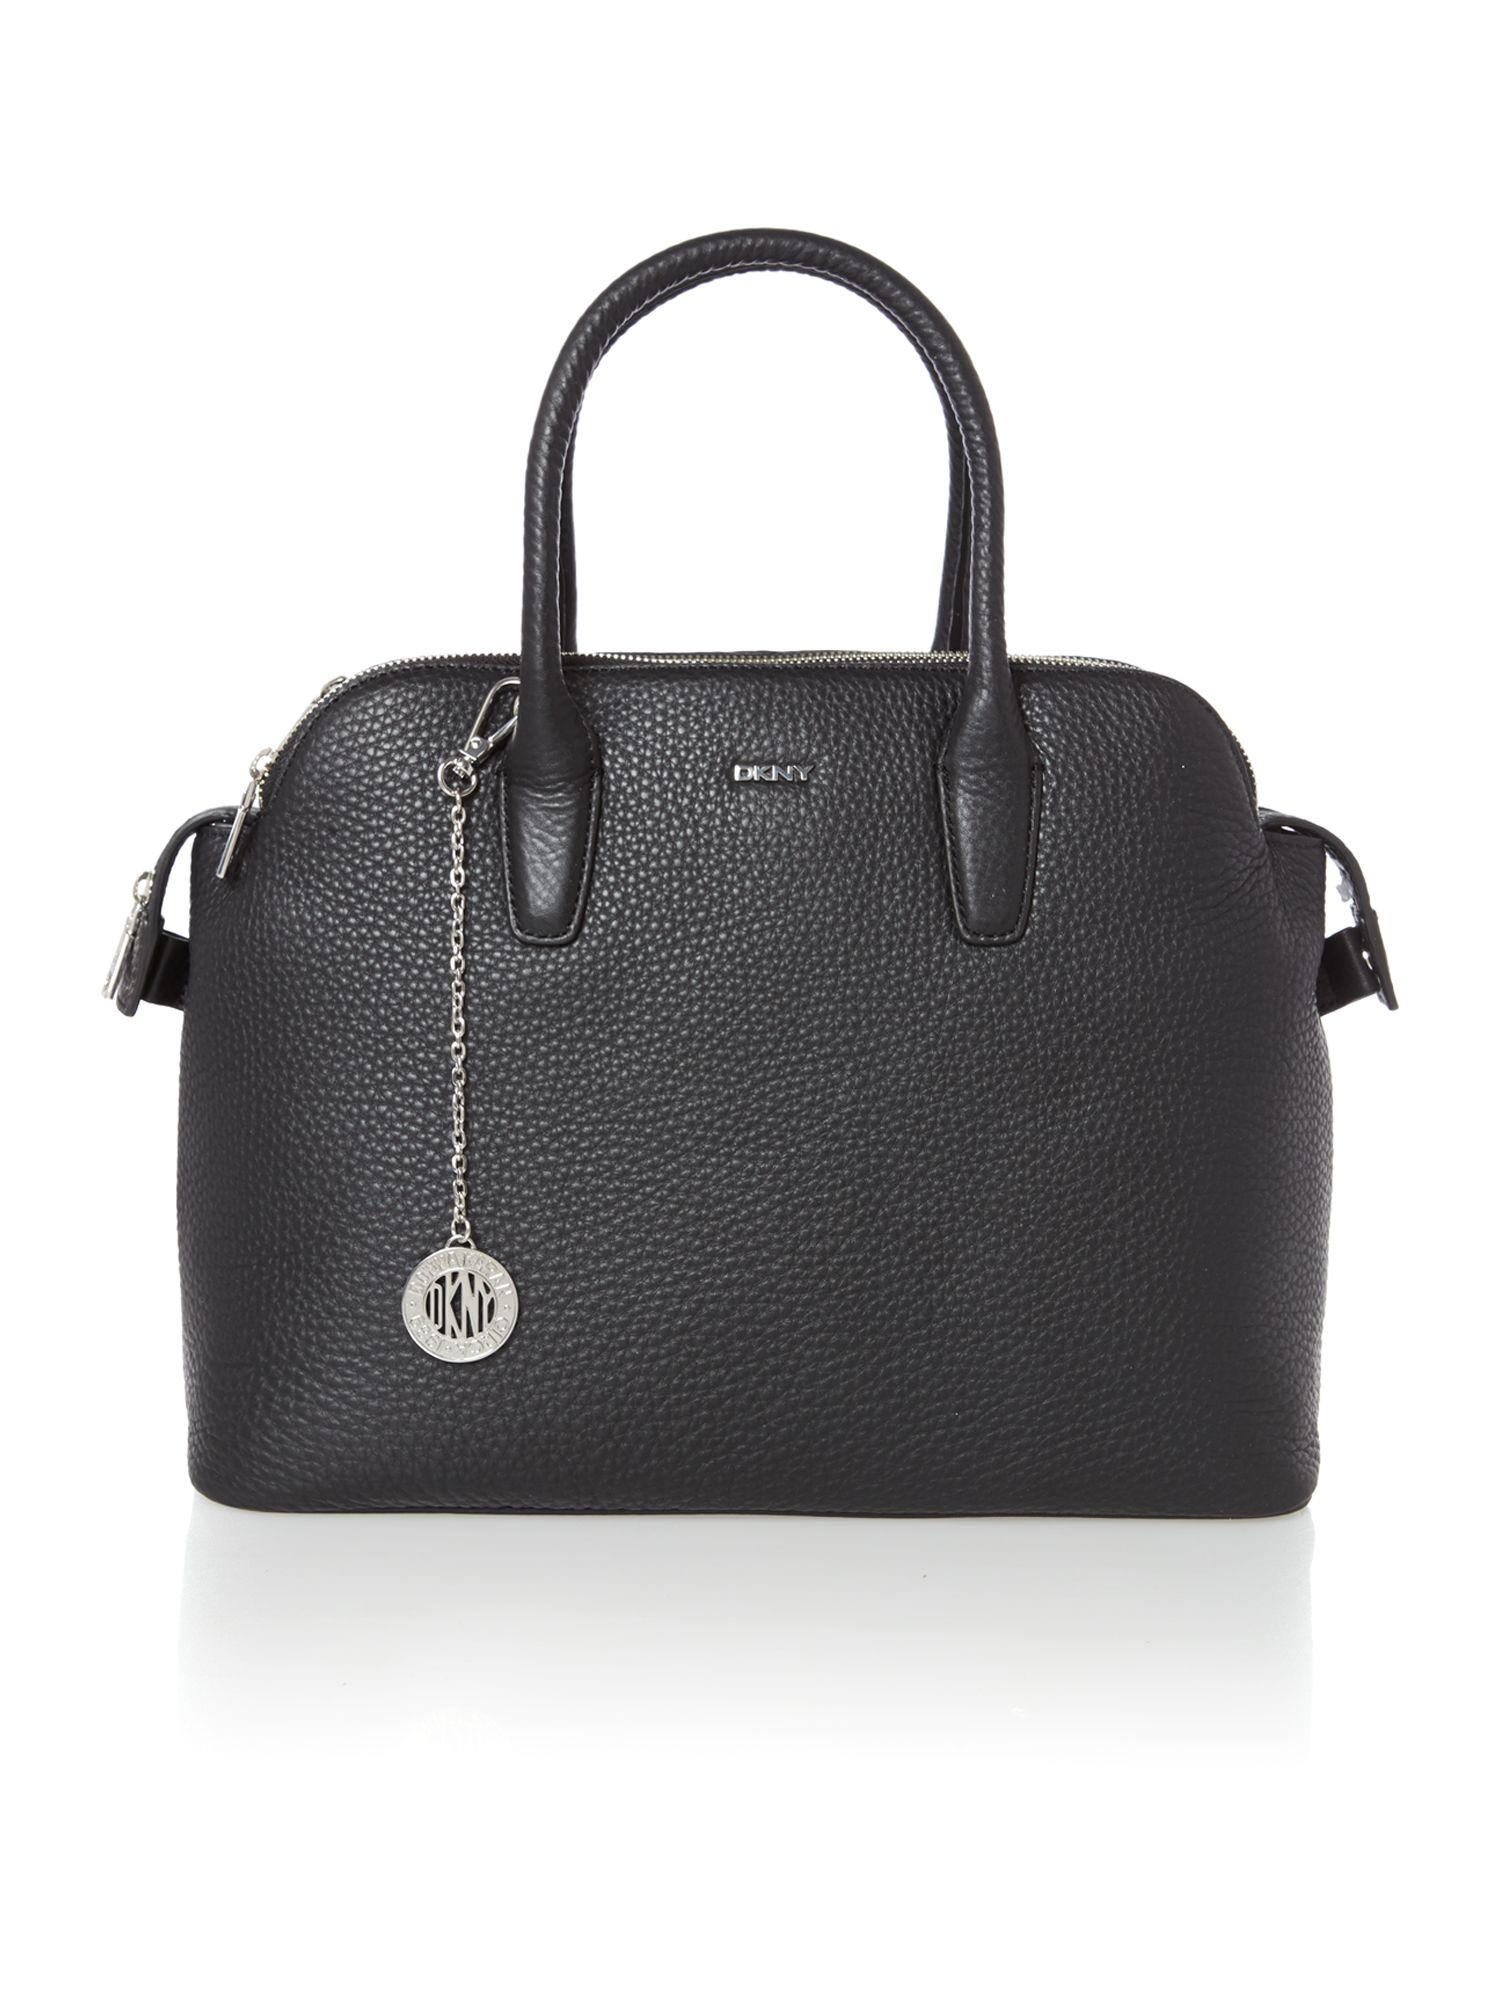 dkny tribeca black tote bag in black lyst